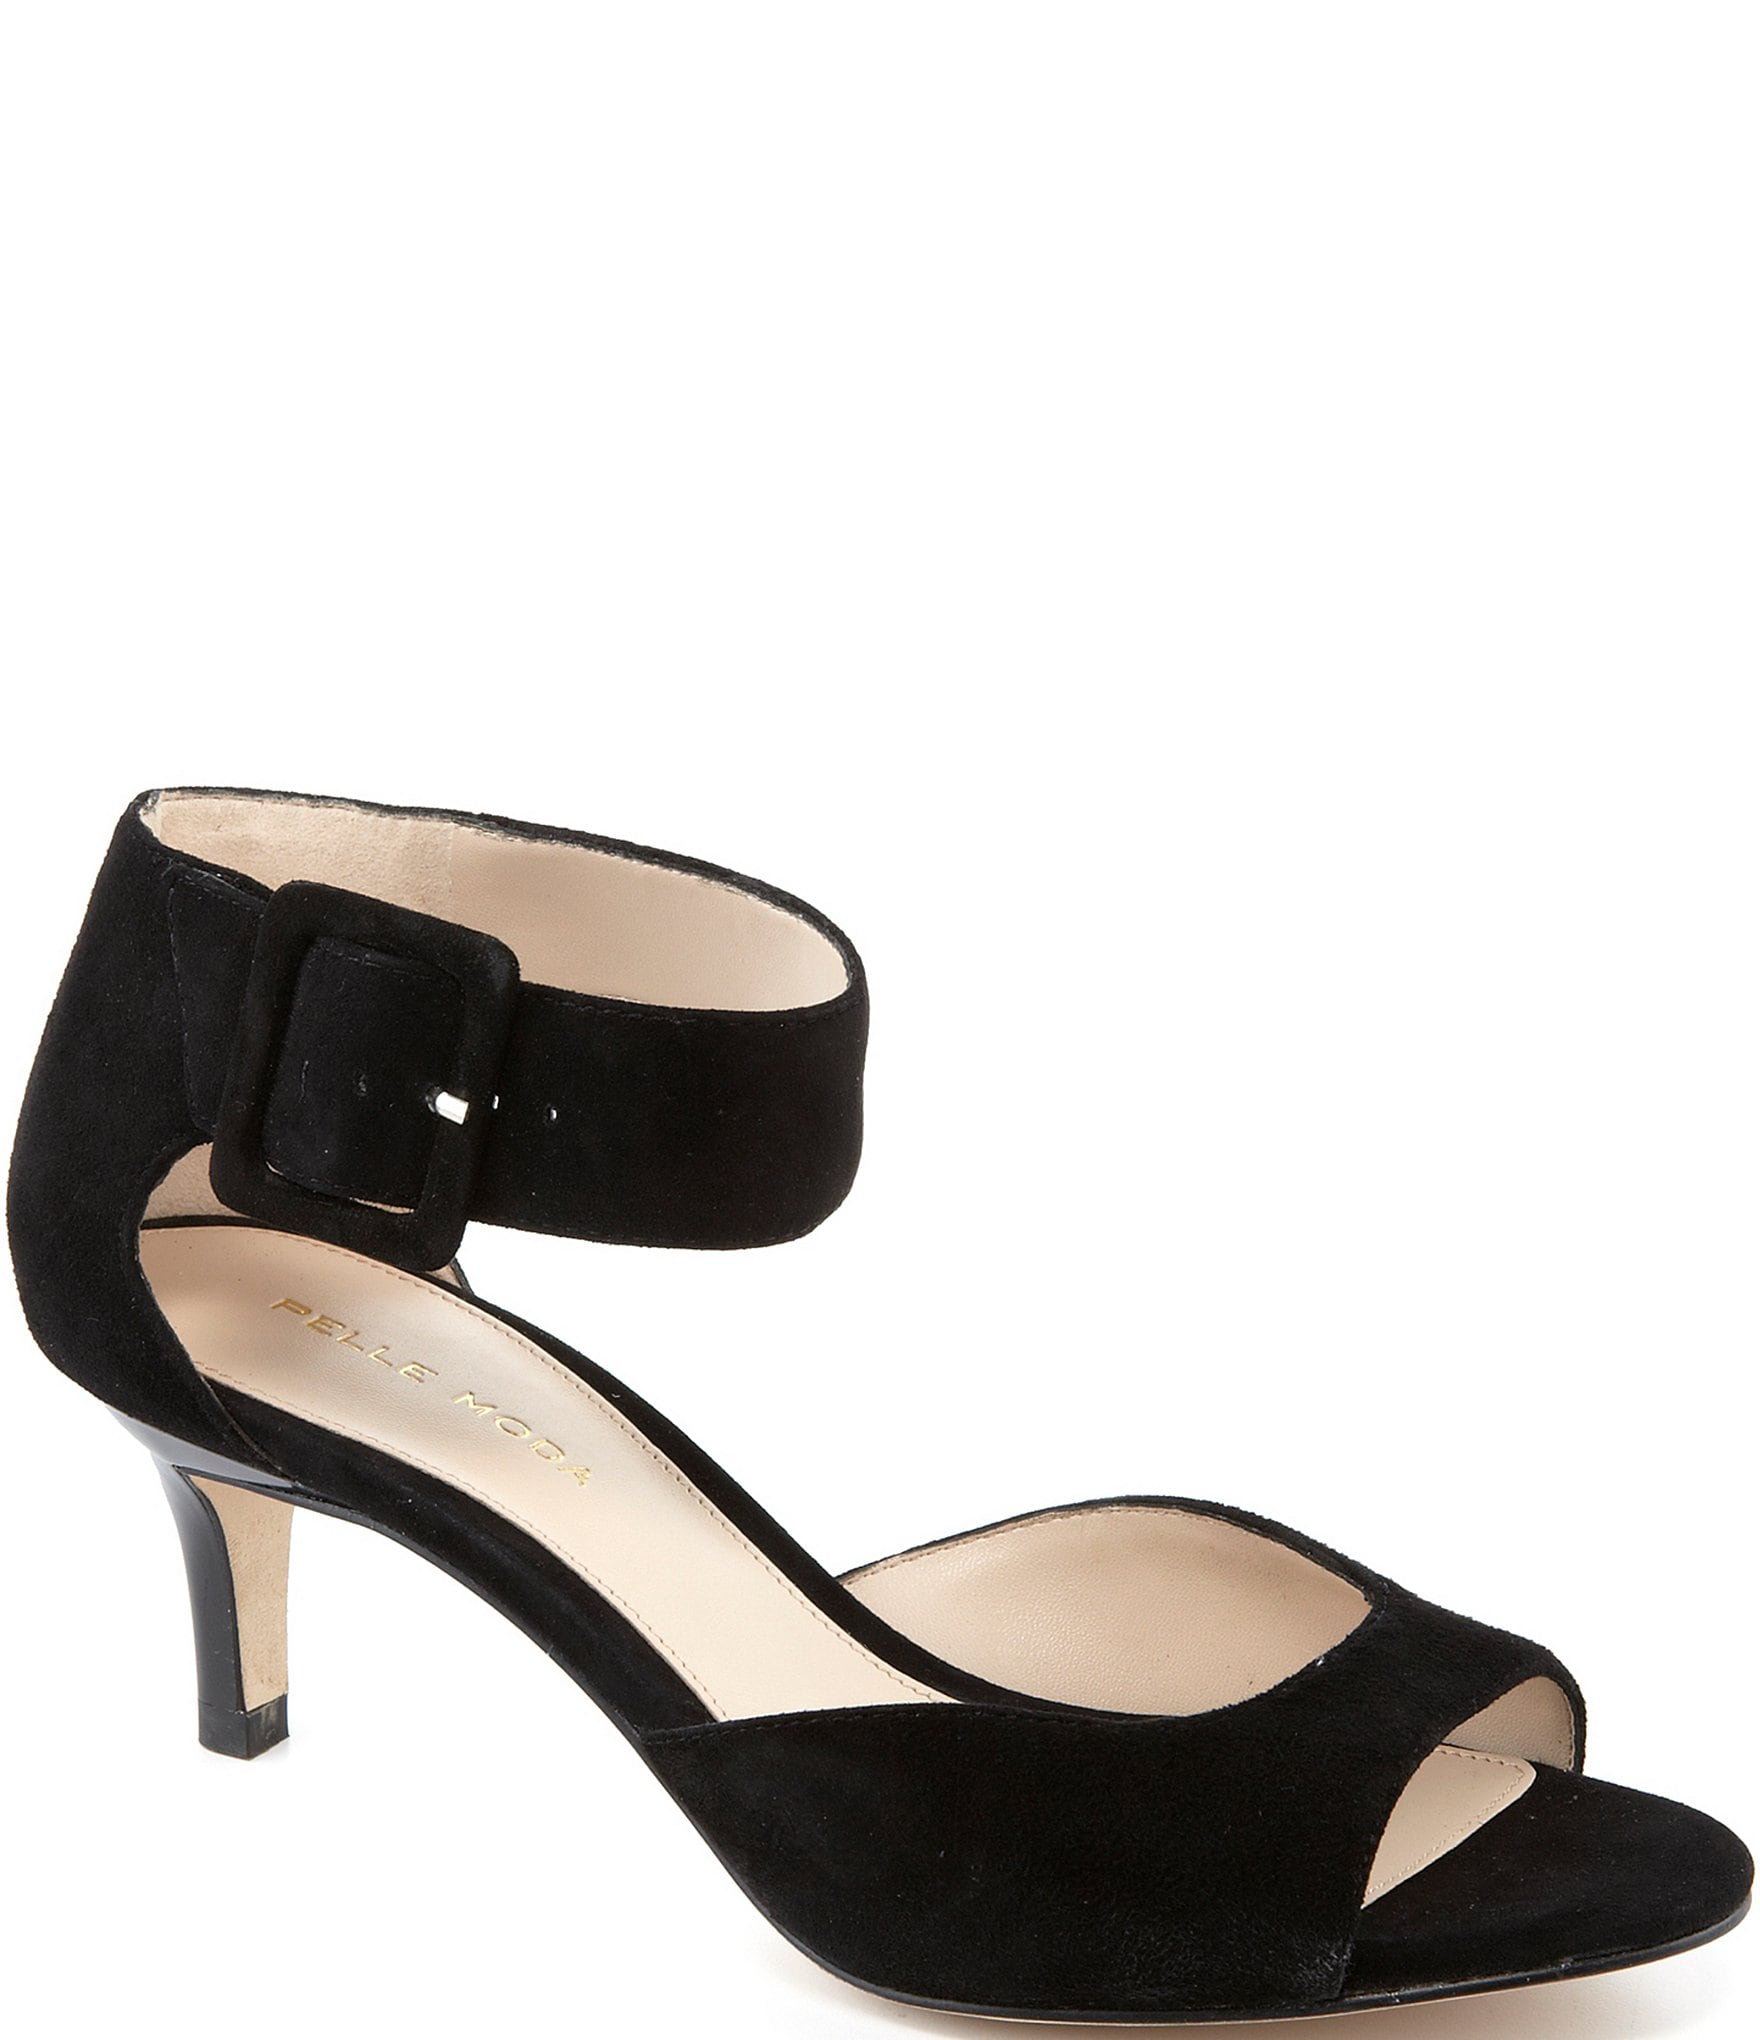 8f2696b9867 Kitten Heel Women s Sandals